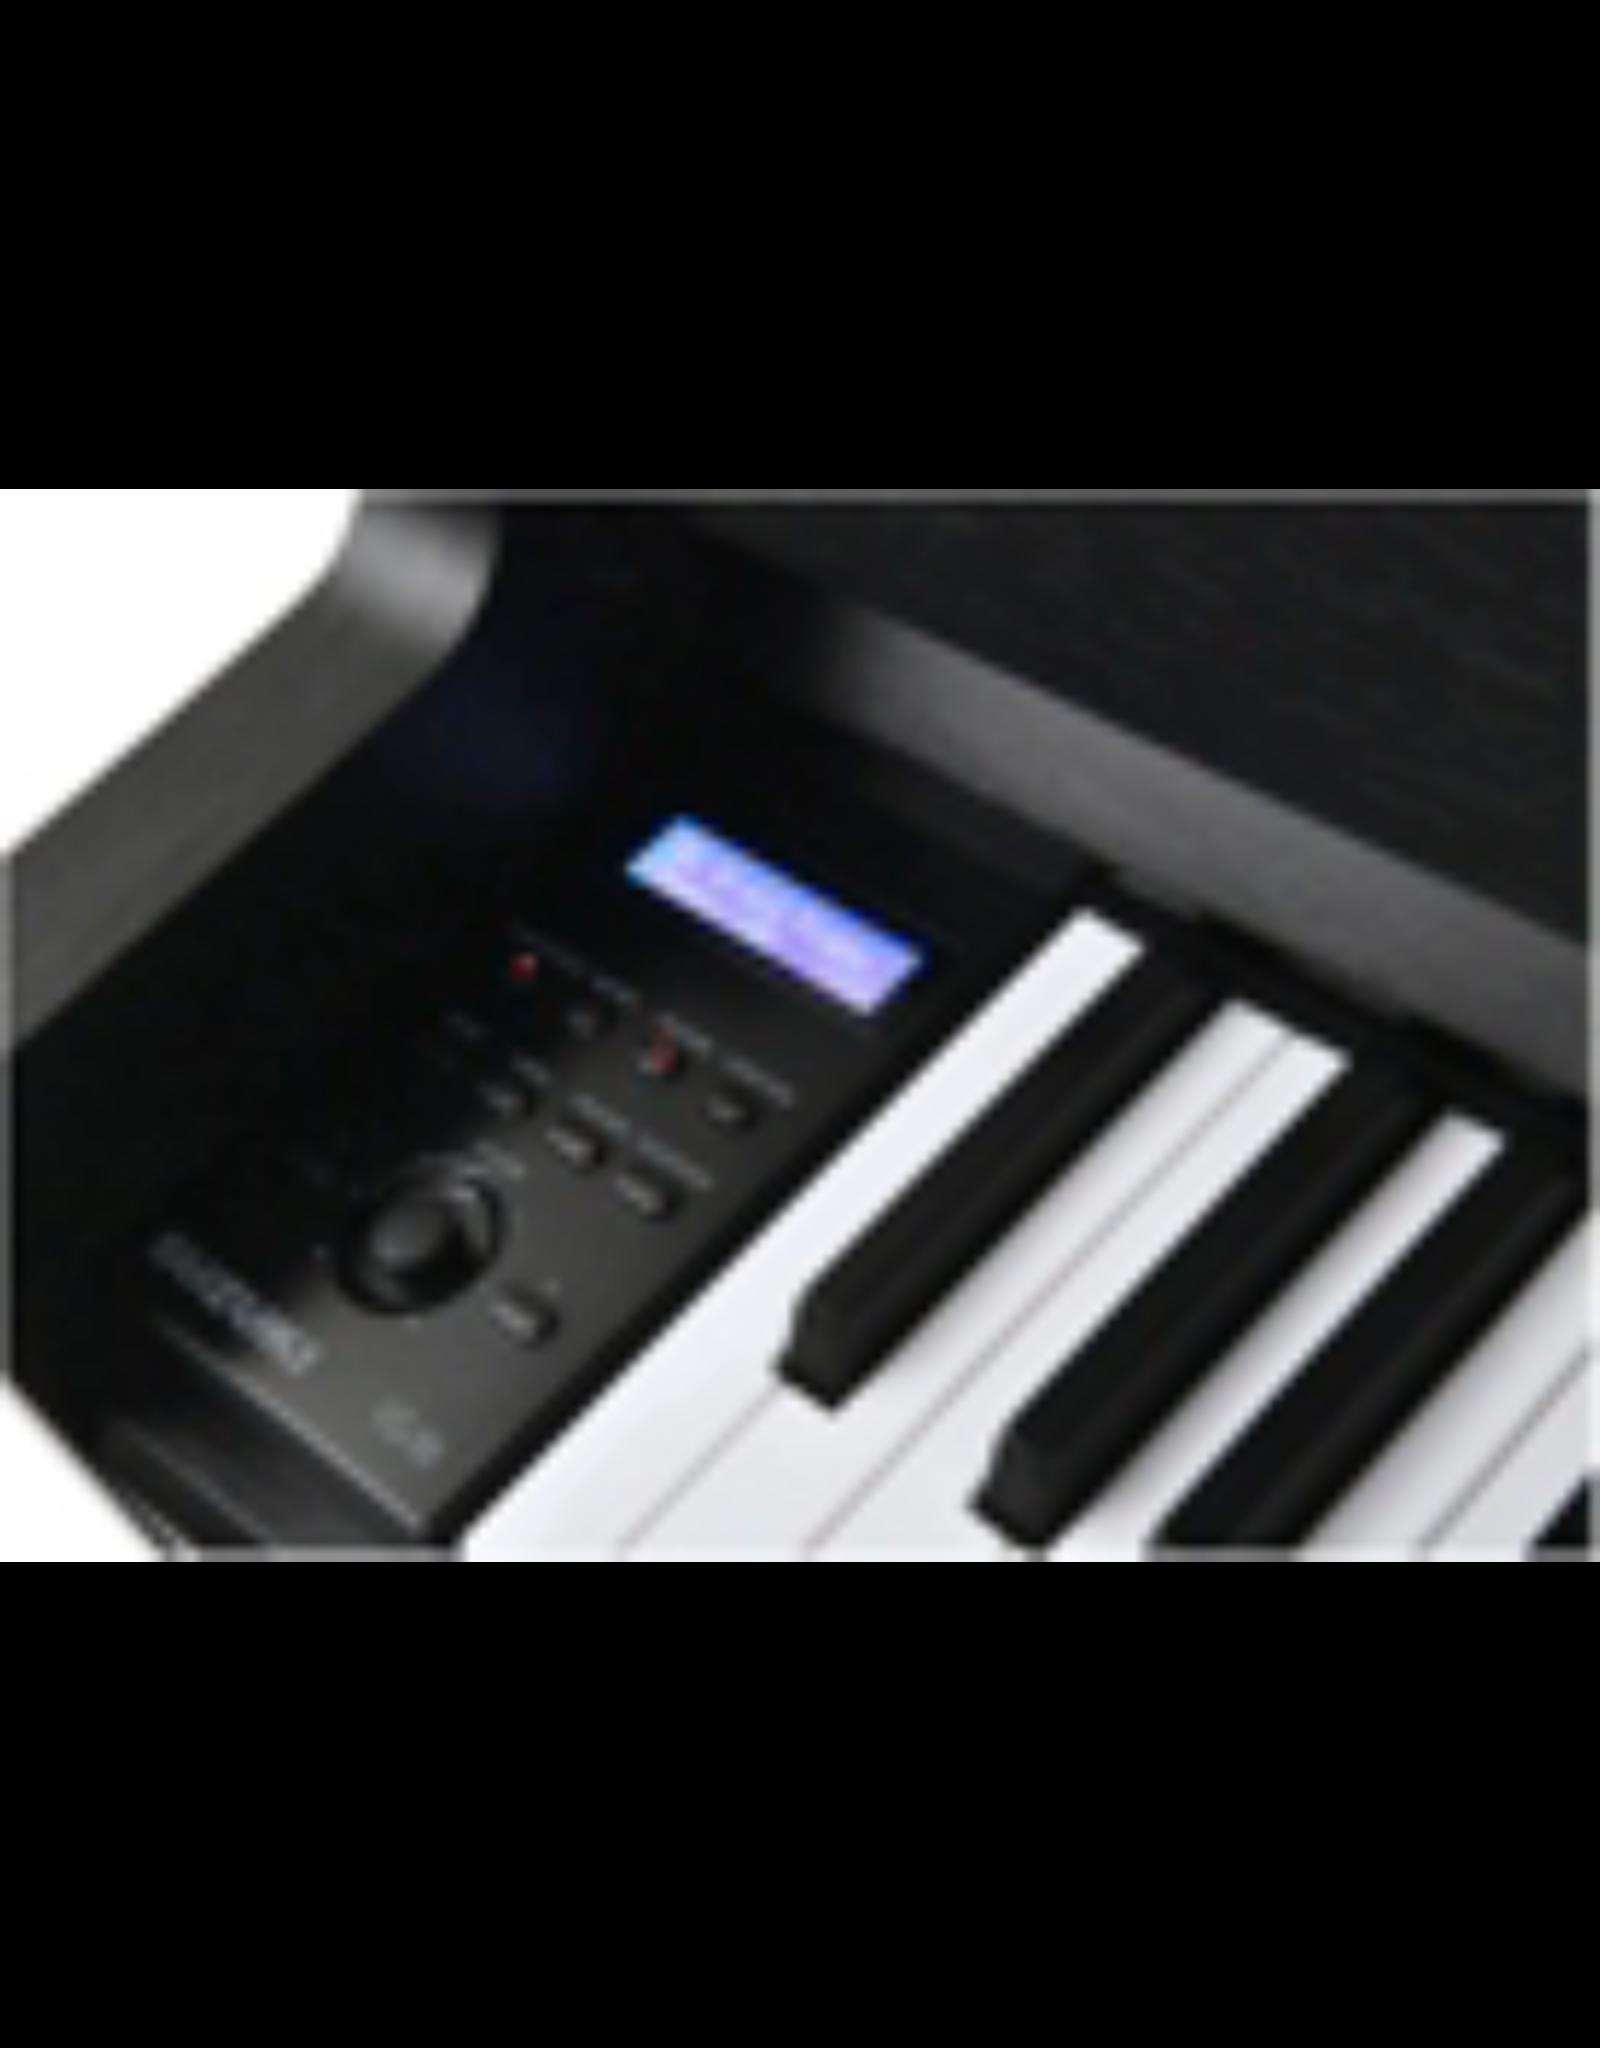 Suzuki Suzuki VG-88 Vertical Grand Console Digital Piano